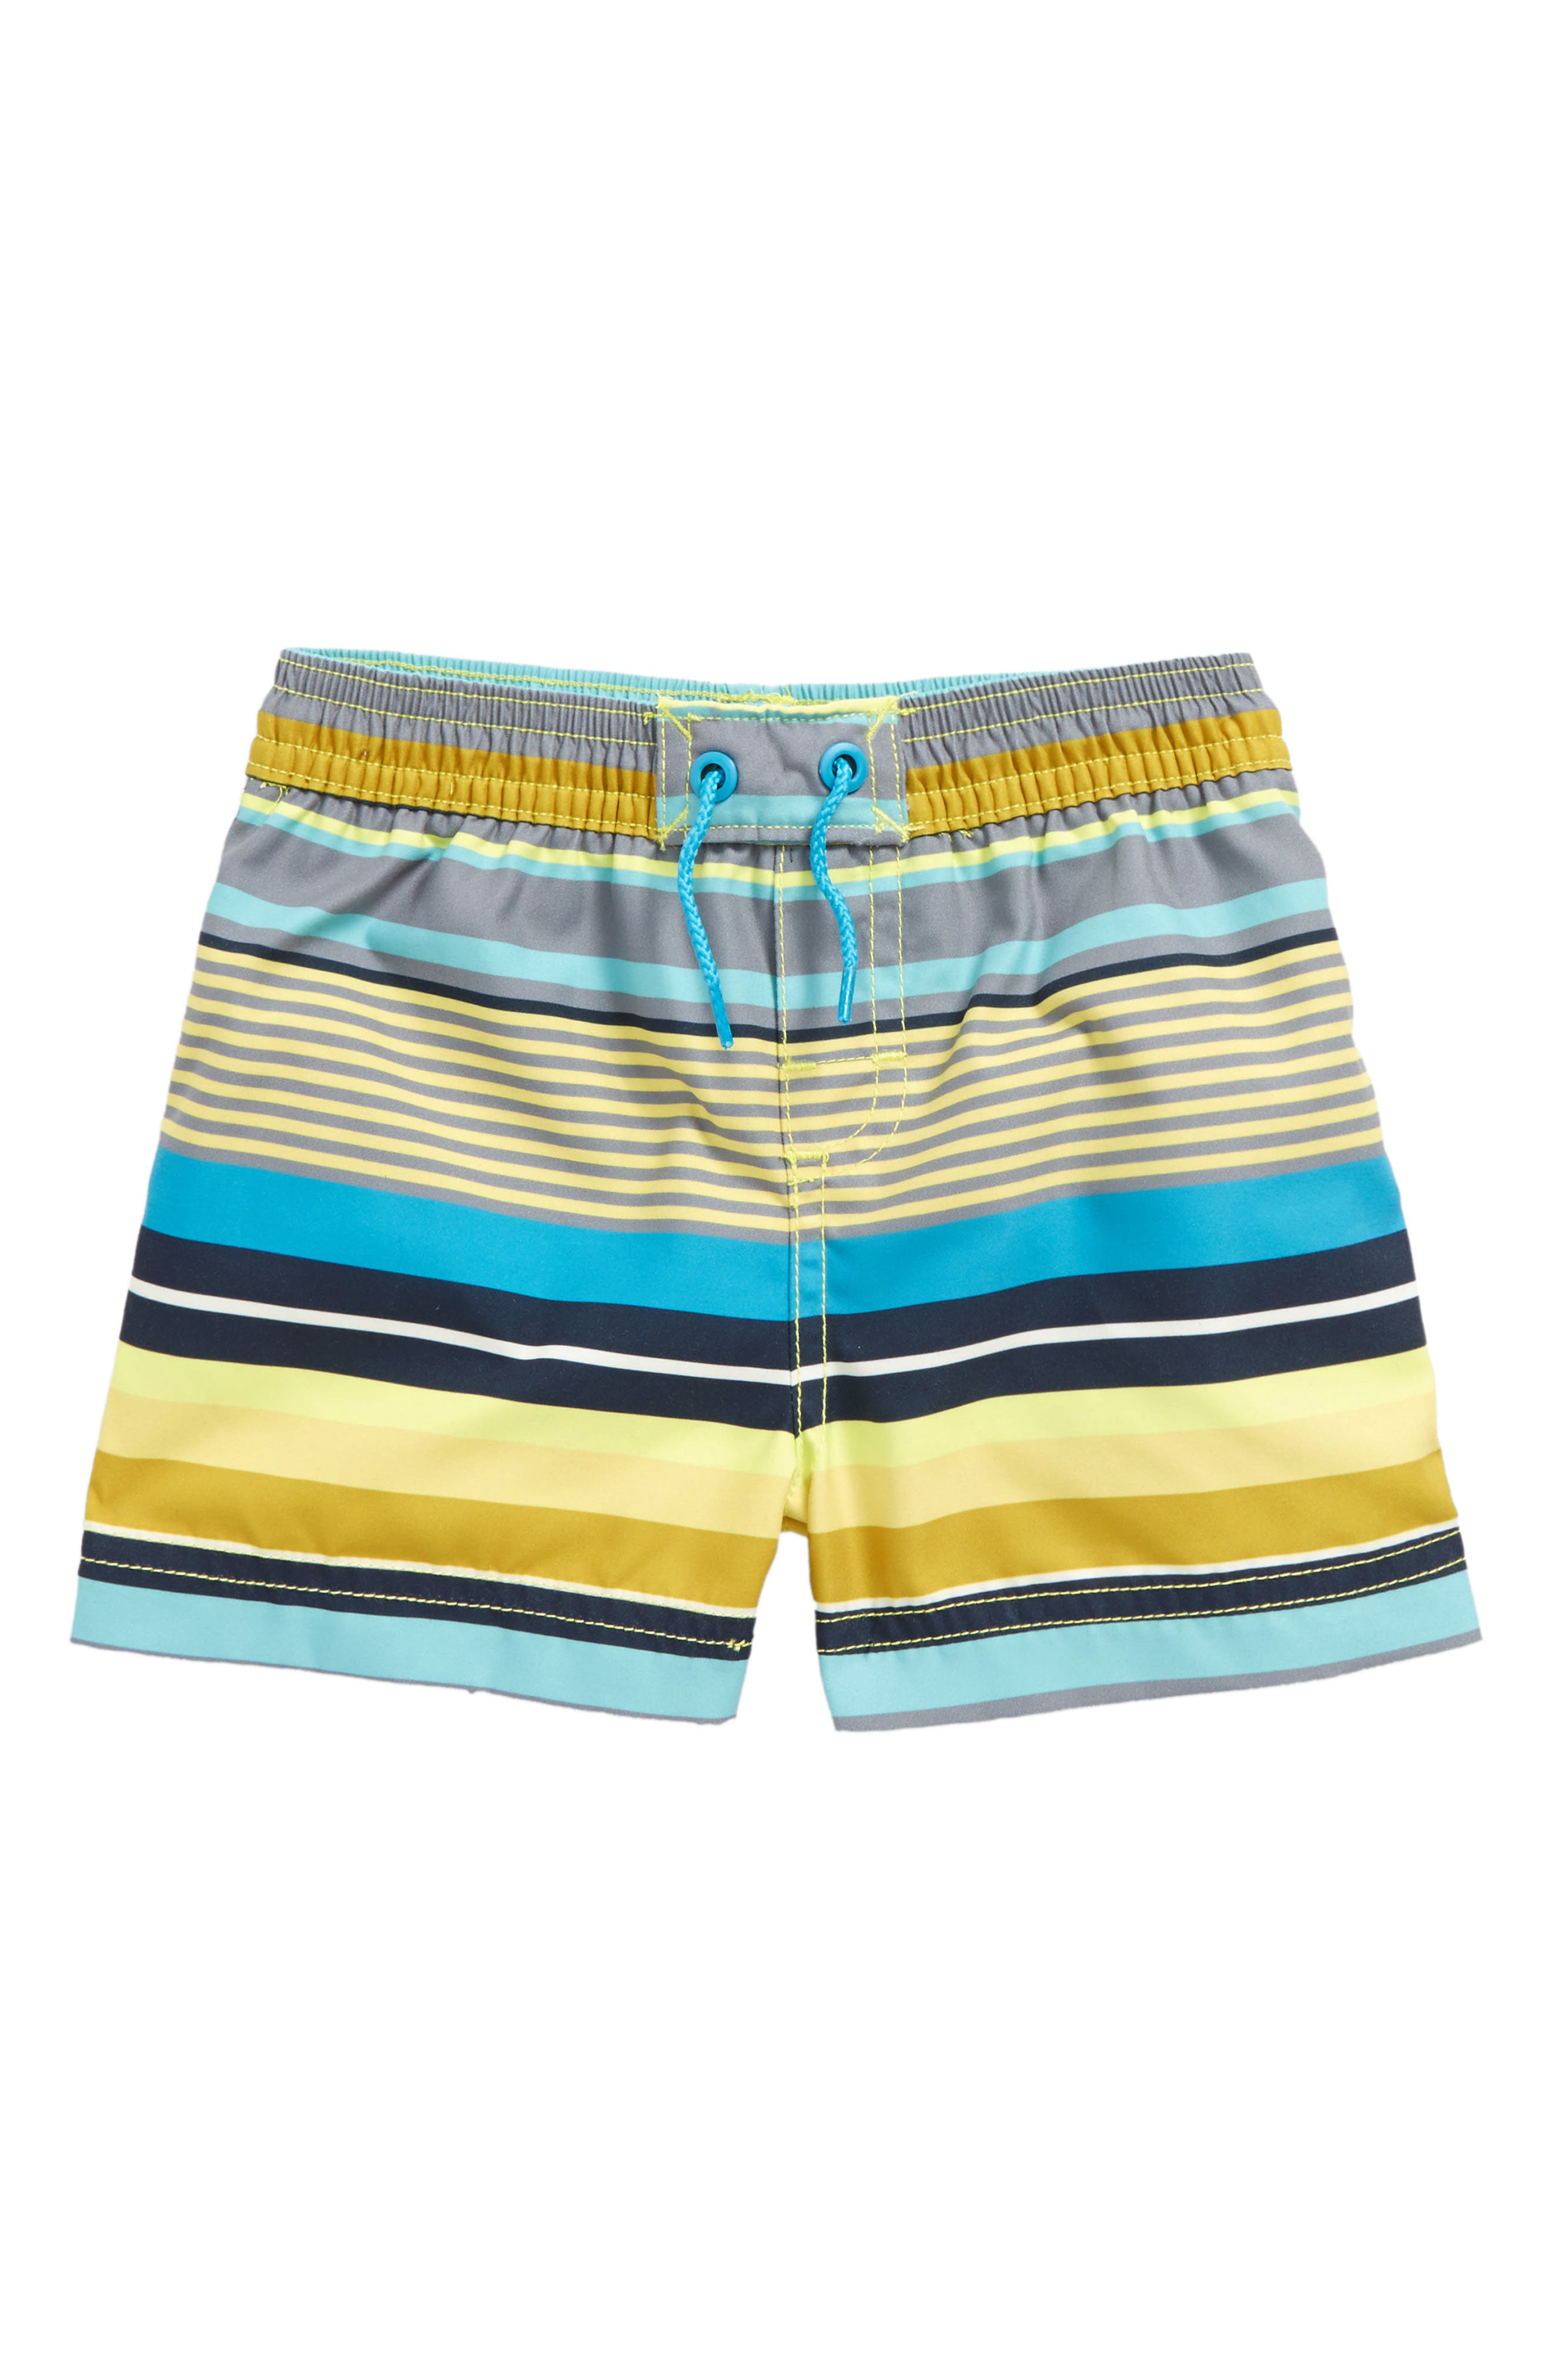 Dawn Patrol Swim Trunks,                         Main,                         color, High Visibility